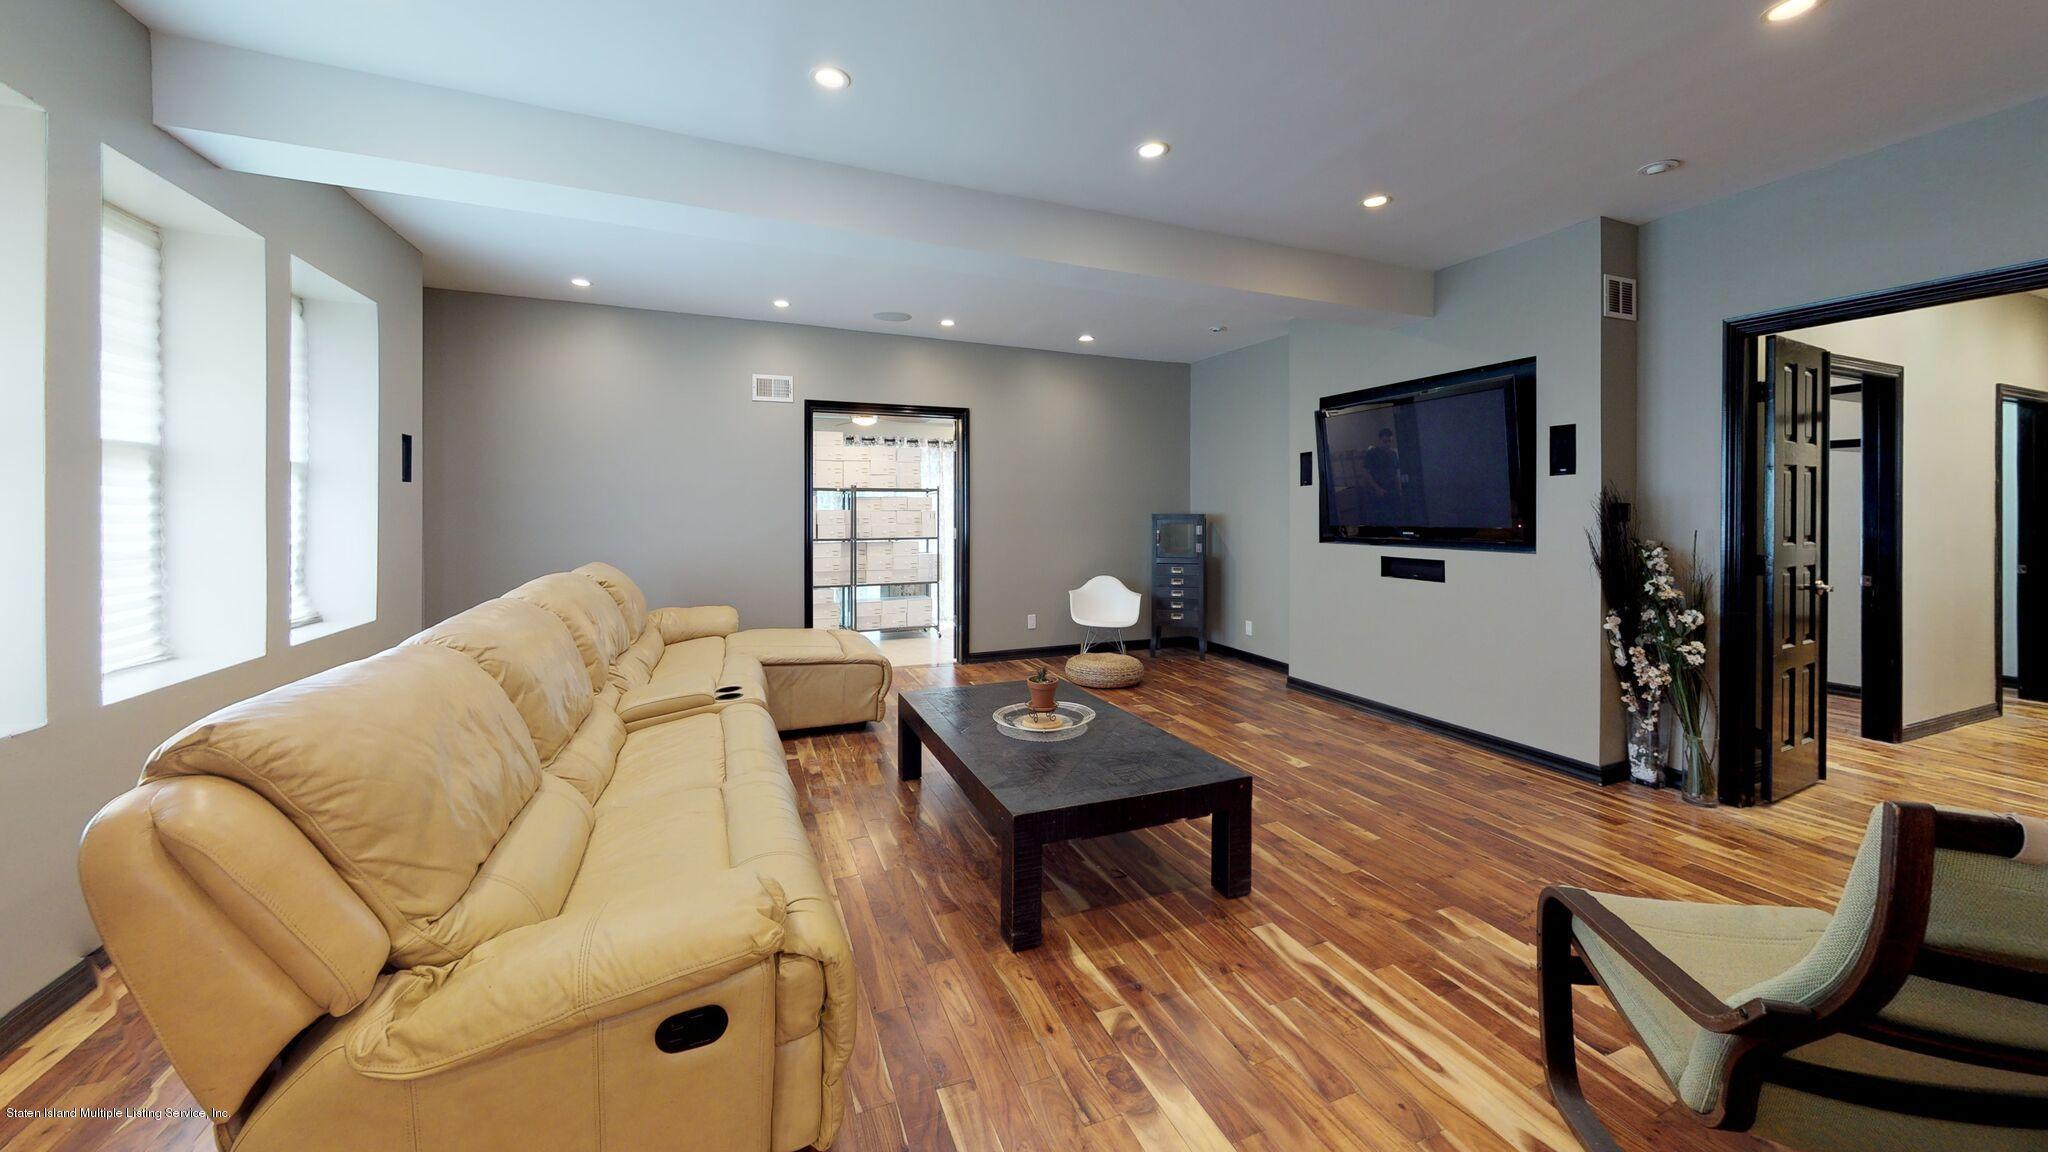 Single Family - Detached 128 Pelton Avenue  Staten Island, NY 10310, MLS-1124023-5